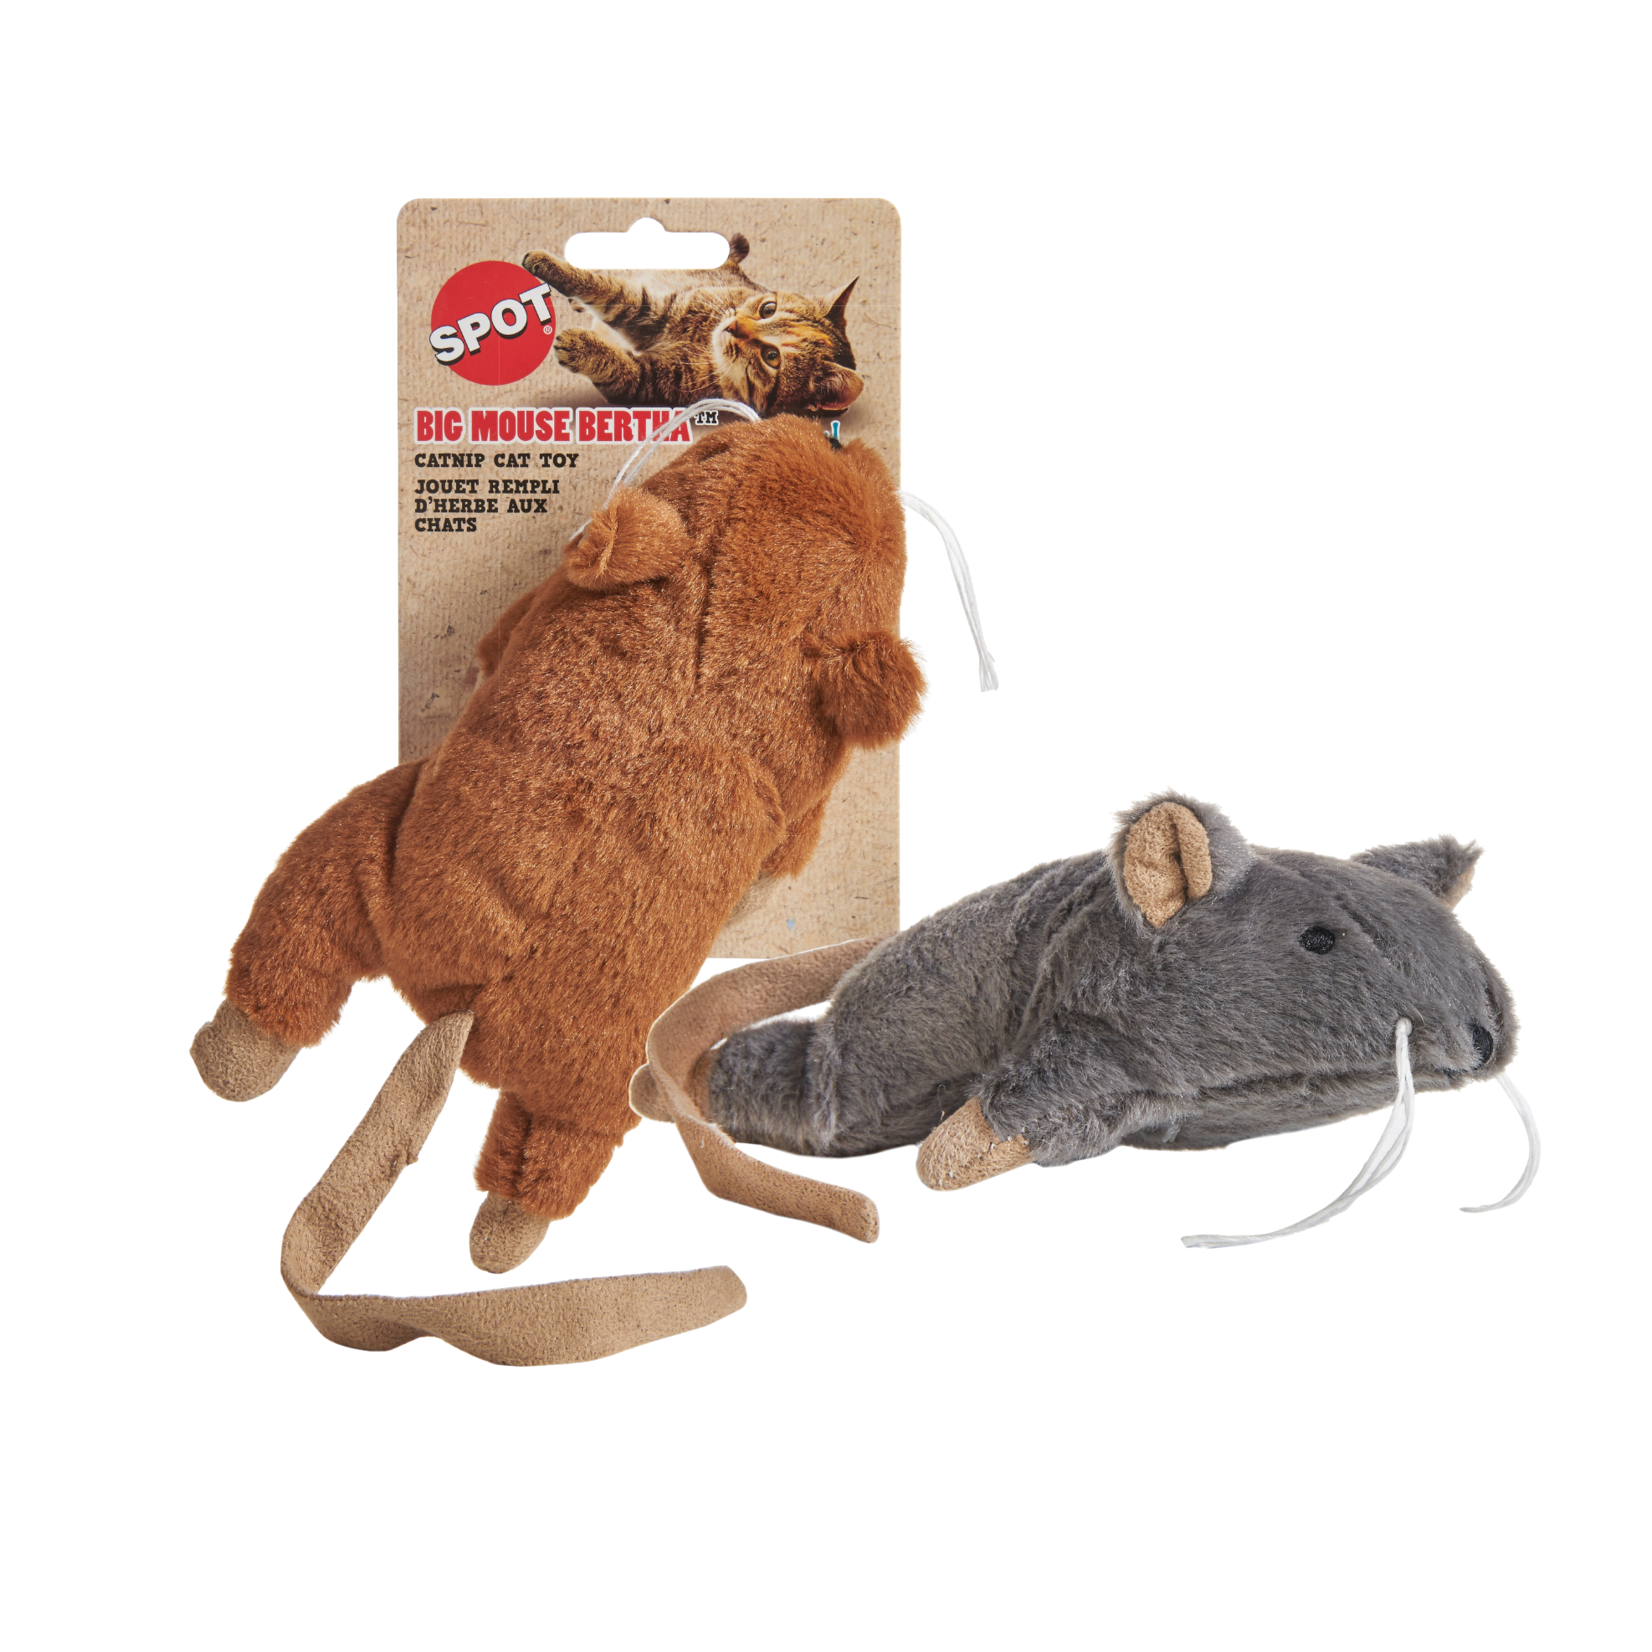 sharples Big Mouse Bertha Large Catnip Cat Toy